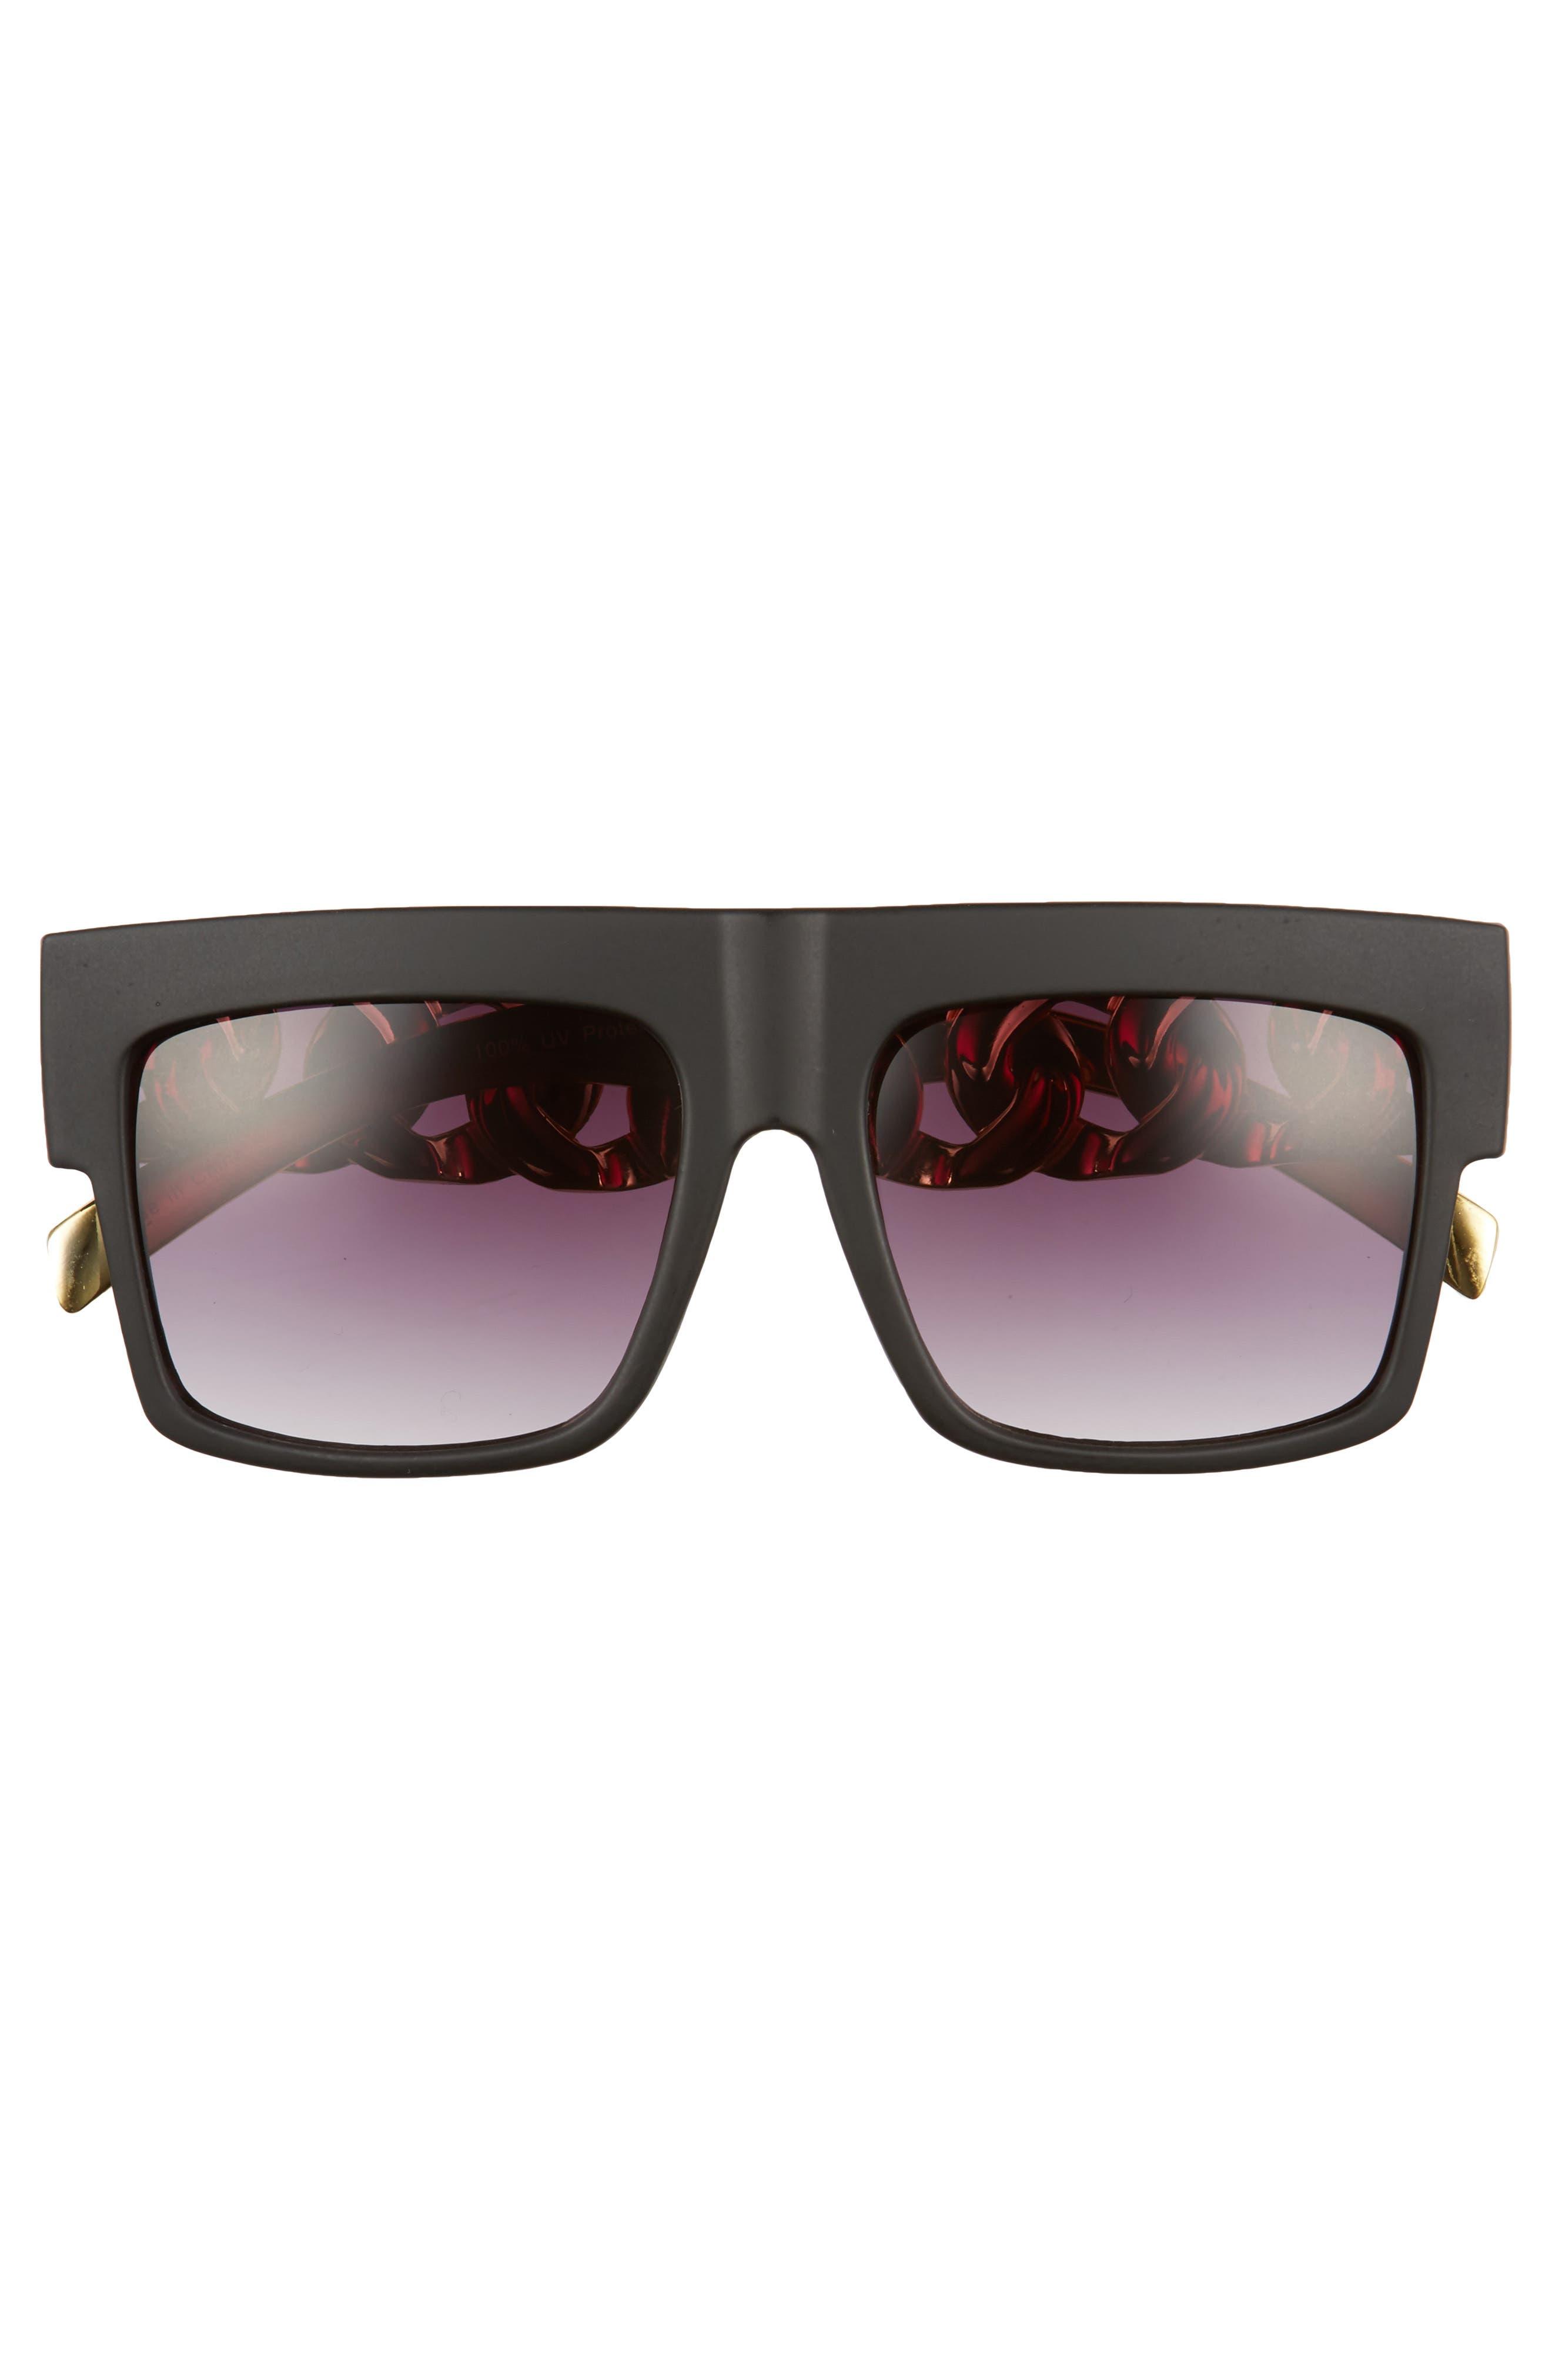 52mm Chain Detail Shield Sunglasses,                             Alternate thumbnail 3, color,                             001